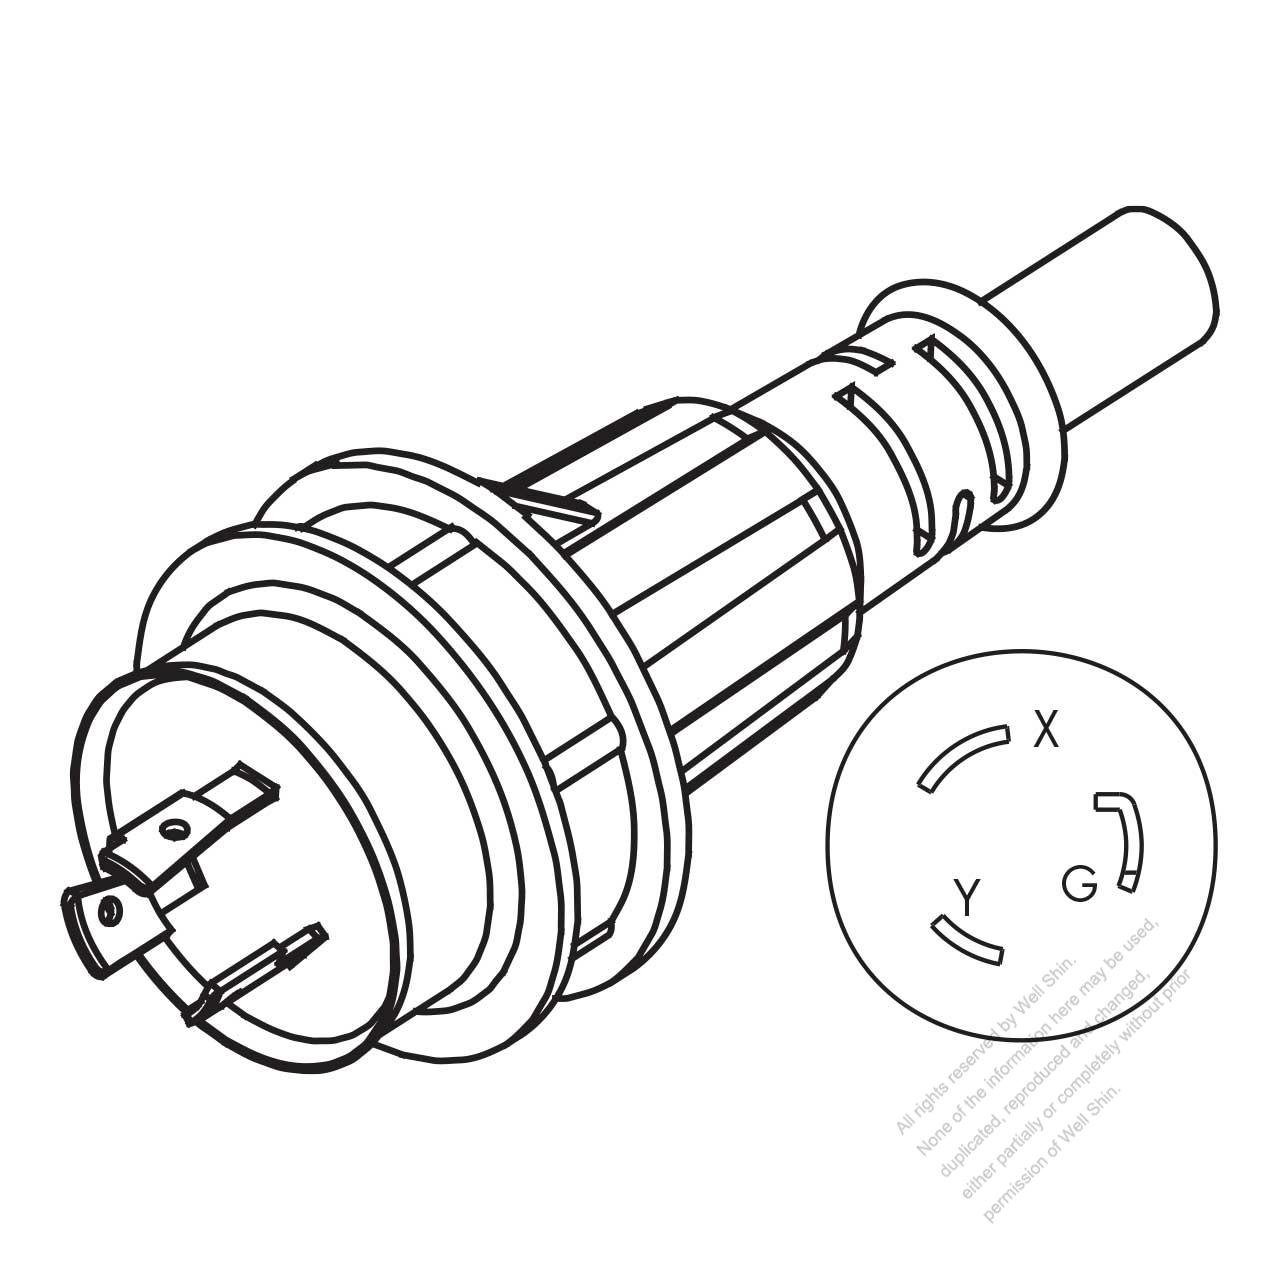 480 volt twist lock plug wiring